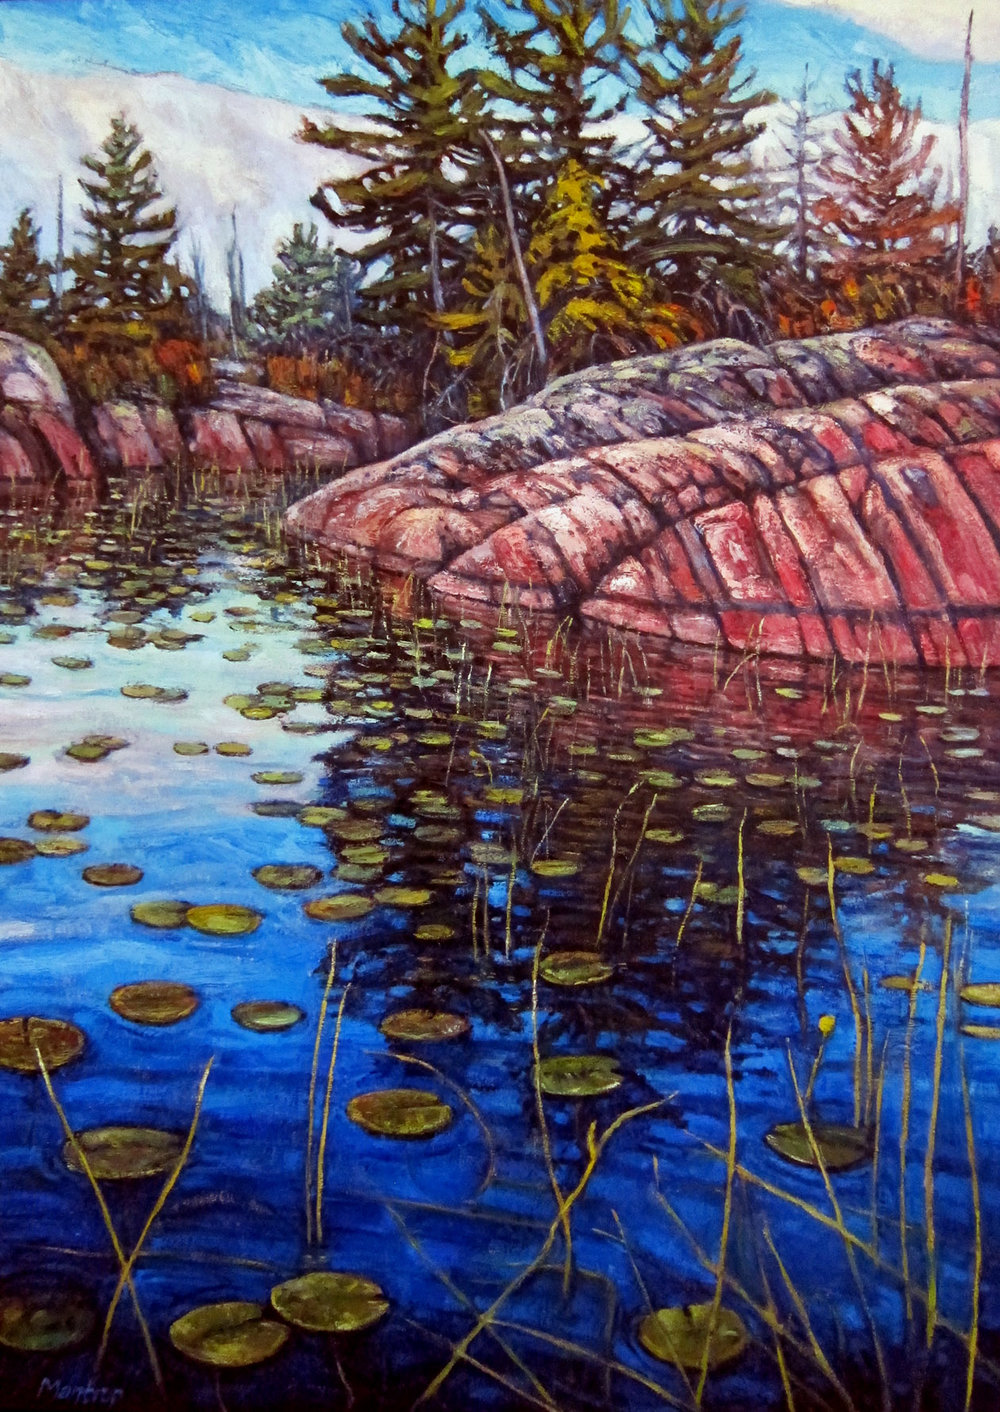 Paul Mantrop,Shield and Shoreline, 2017.